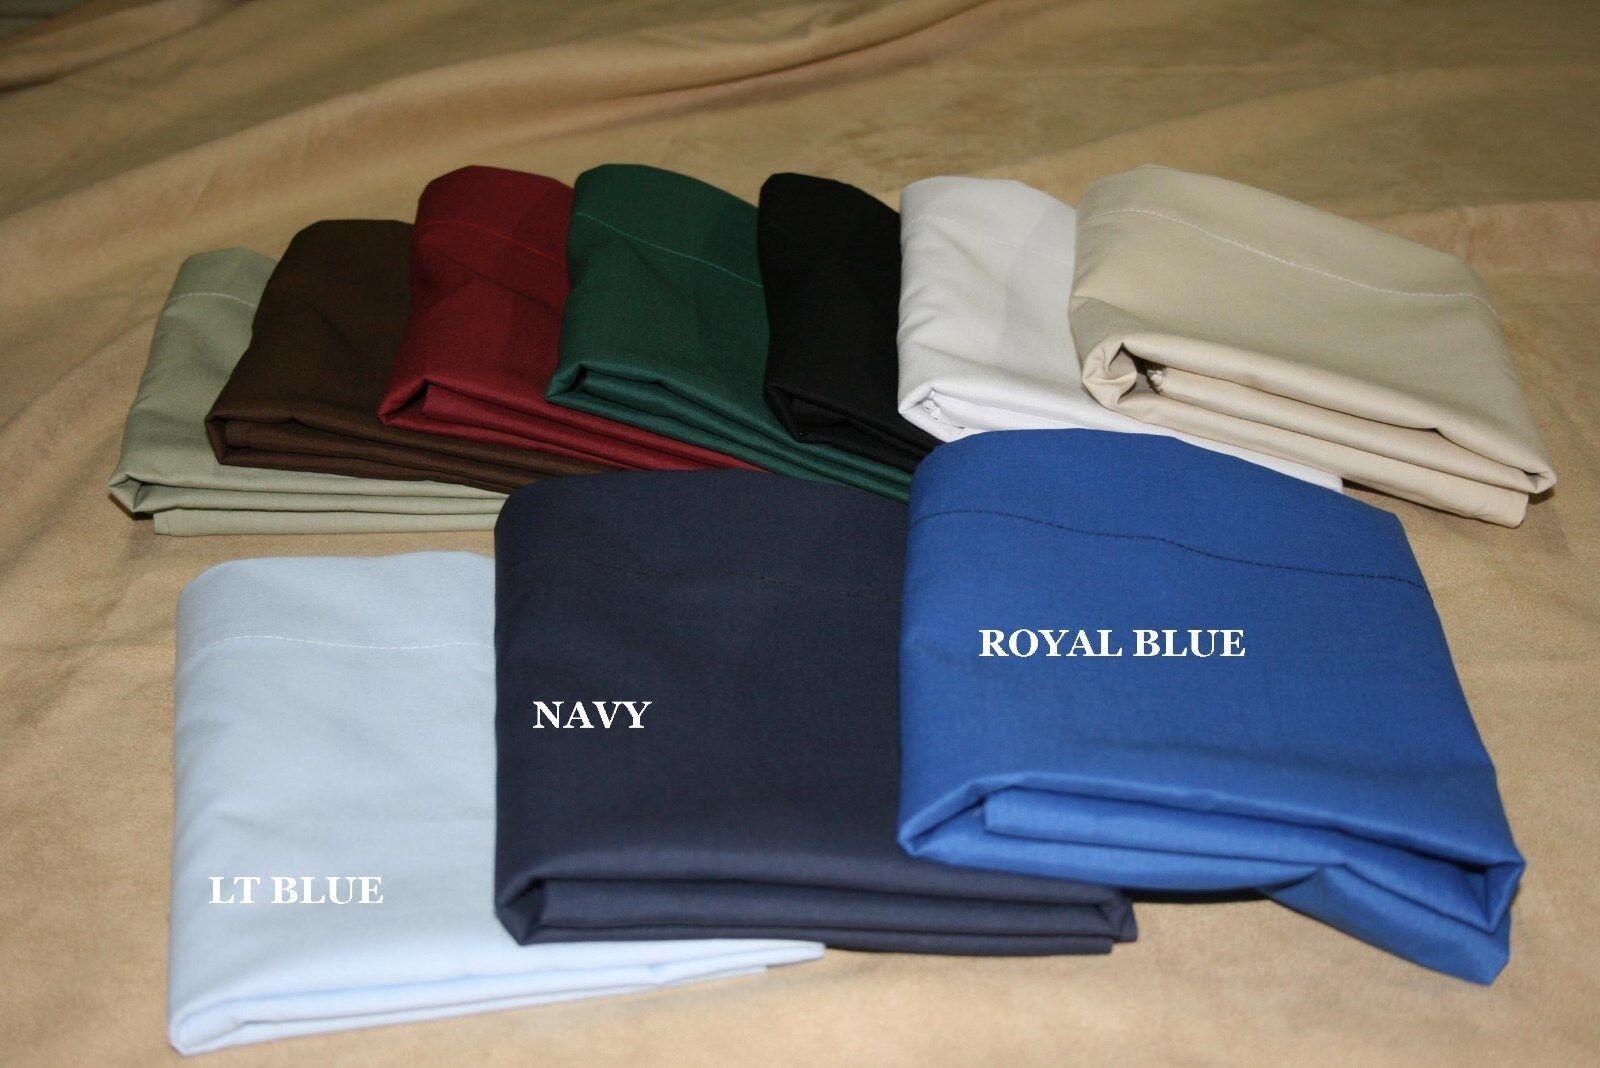 King size Dust Ruffle -Ruffled or Tailored -200TC Lt bluee 14  18  21  drop